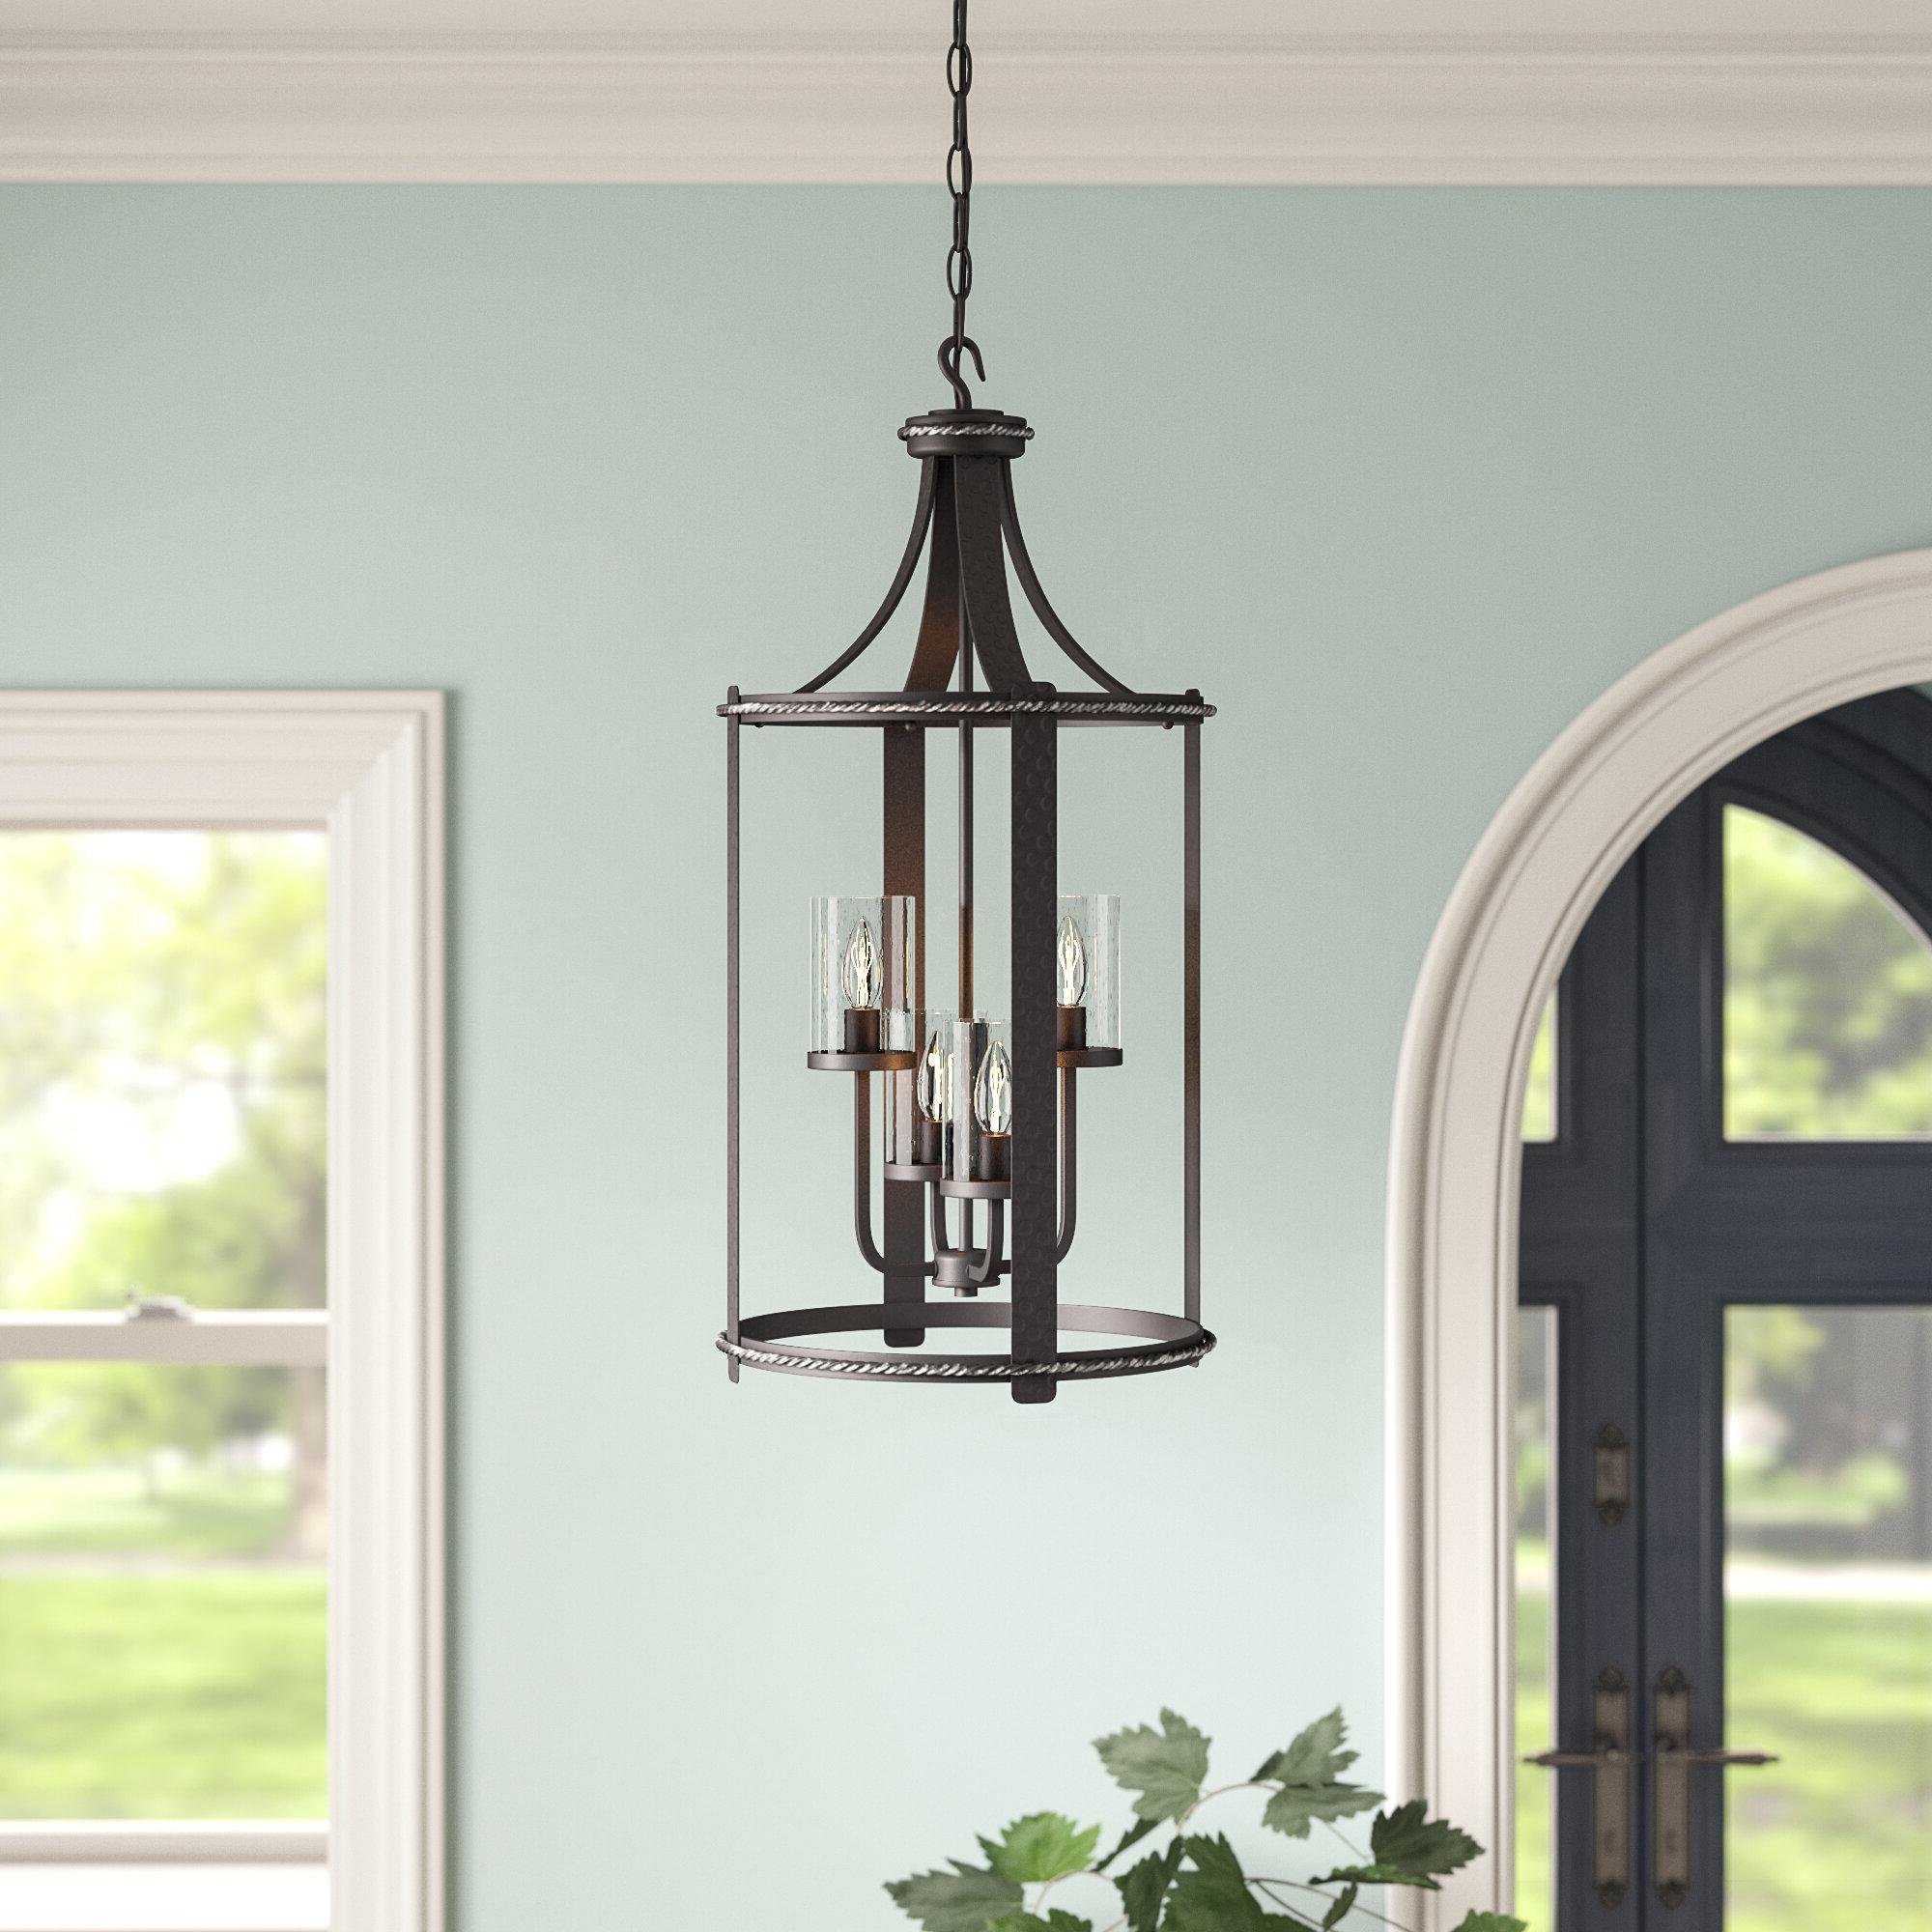 Newest Warner Robins 3 Light Lantern Pendants Inside Halcott 4 Light Lantern Pendant (View 12 of 20)